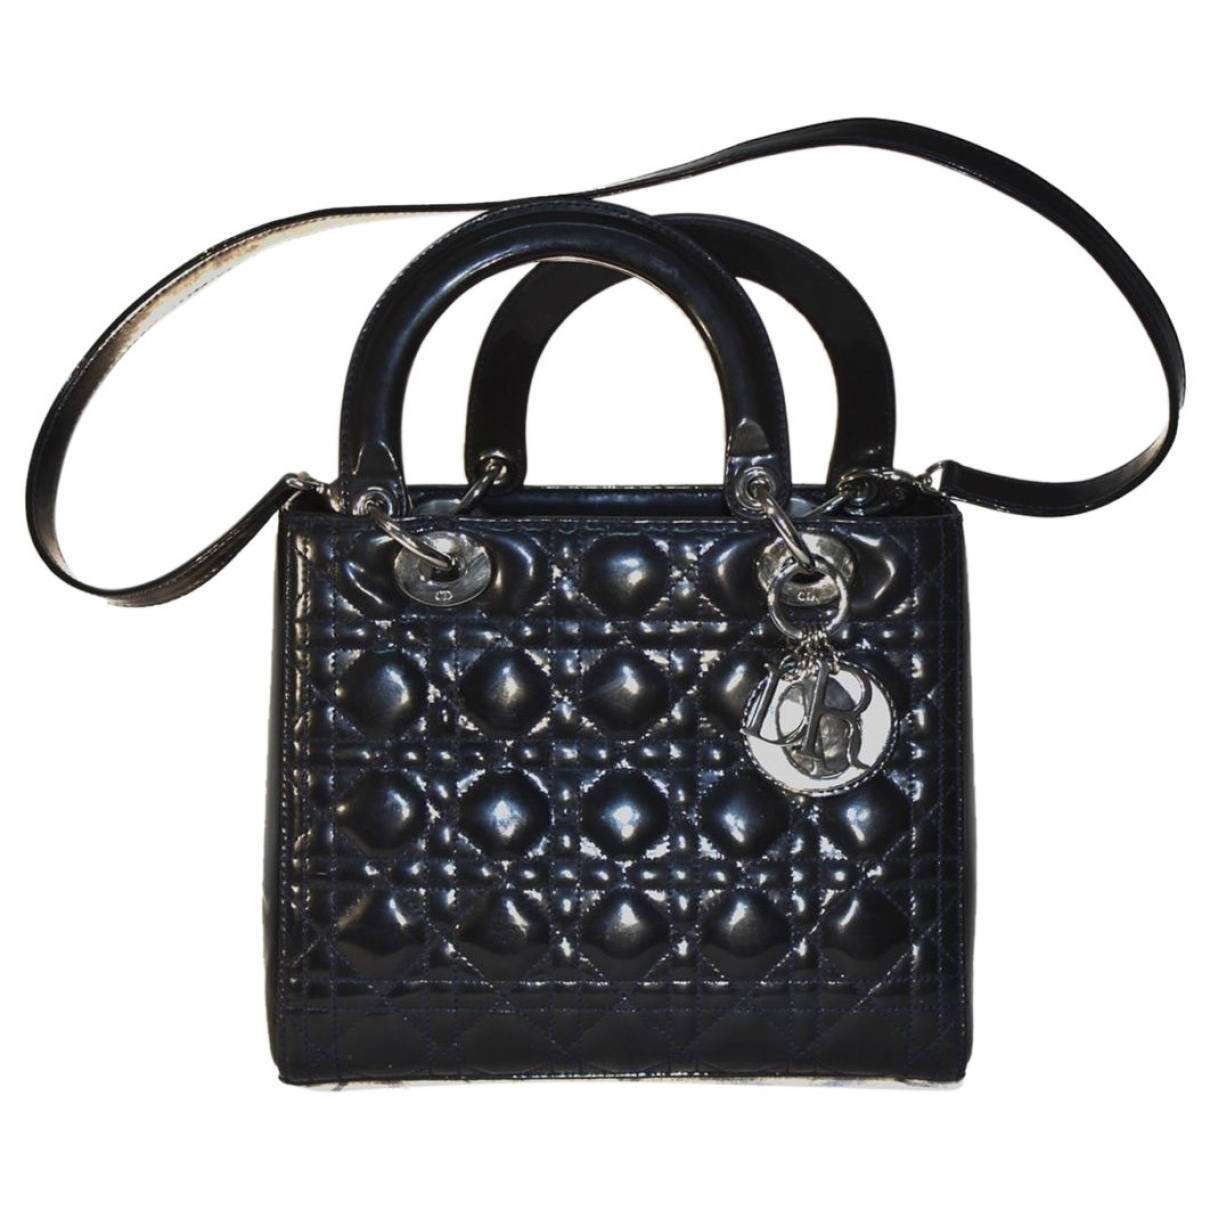 Dior Lady Dior Blue Patent leather handbag for Women \N